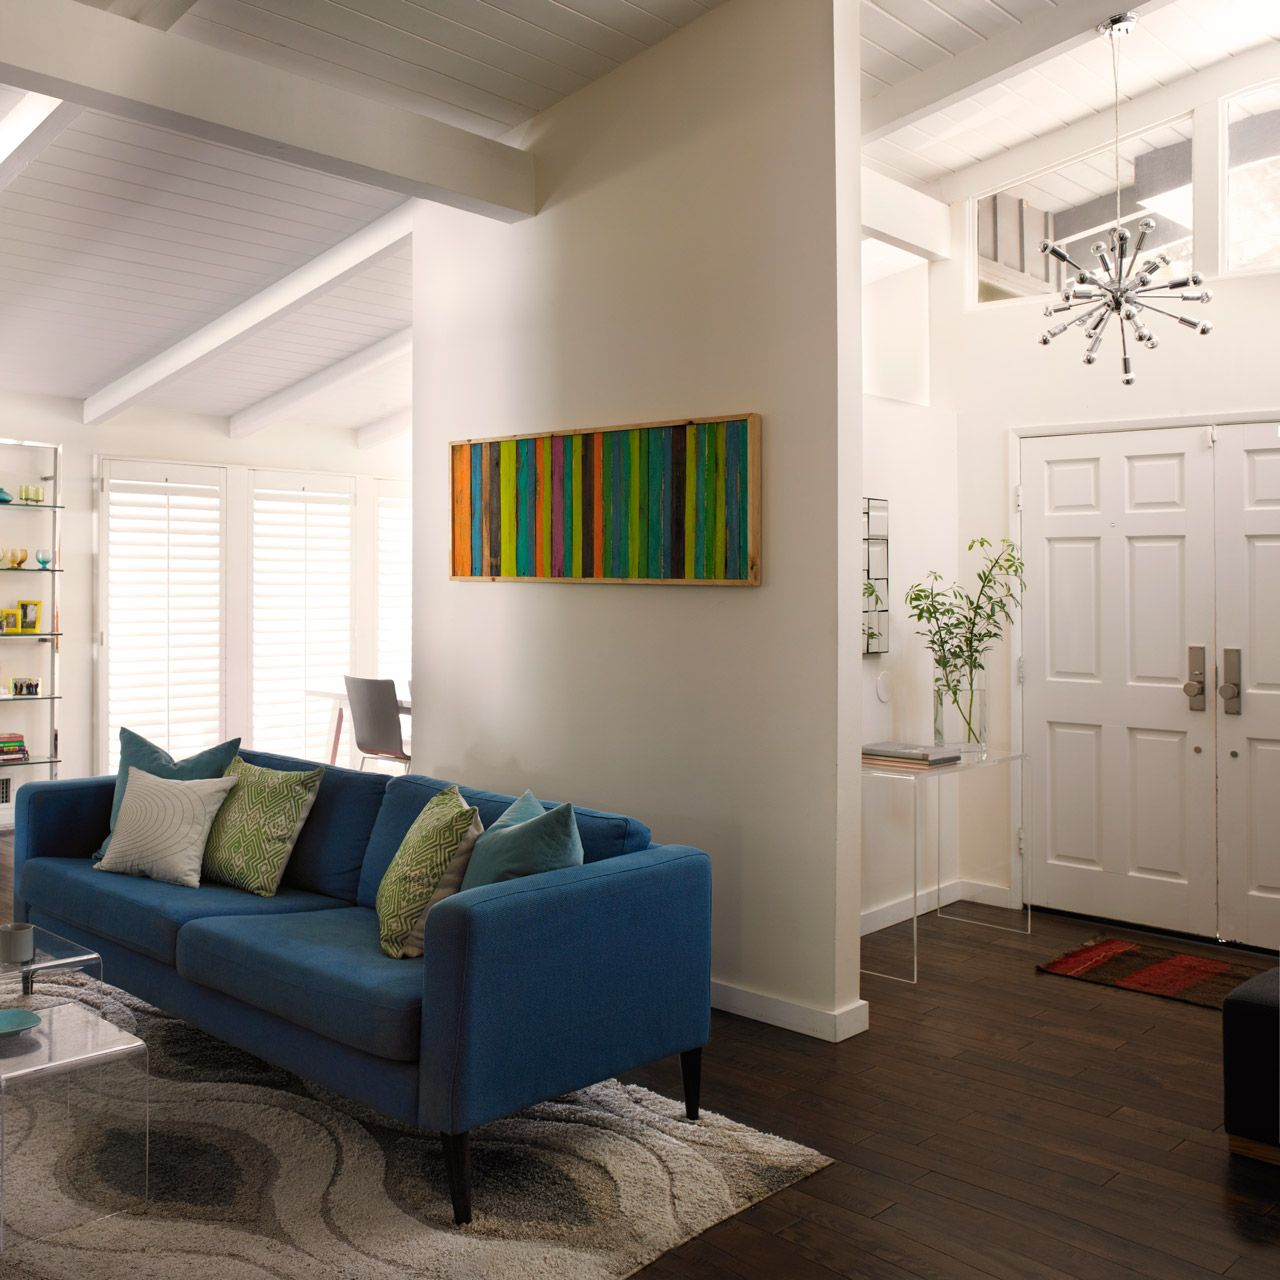 Dunn edwards paints paint color office walls ashwood de6290 living room walls silver fox de6289 living room inspiration pinterest silver foxes